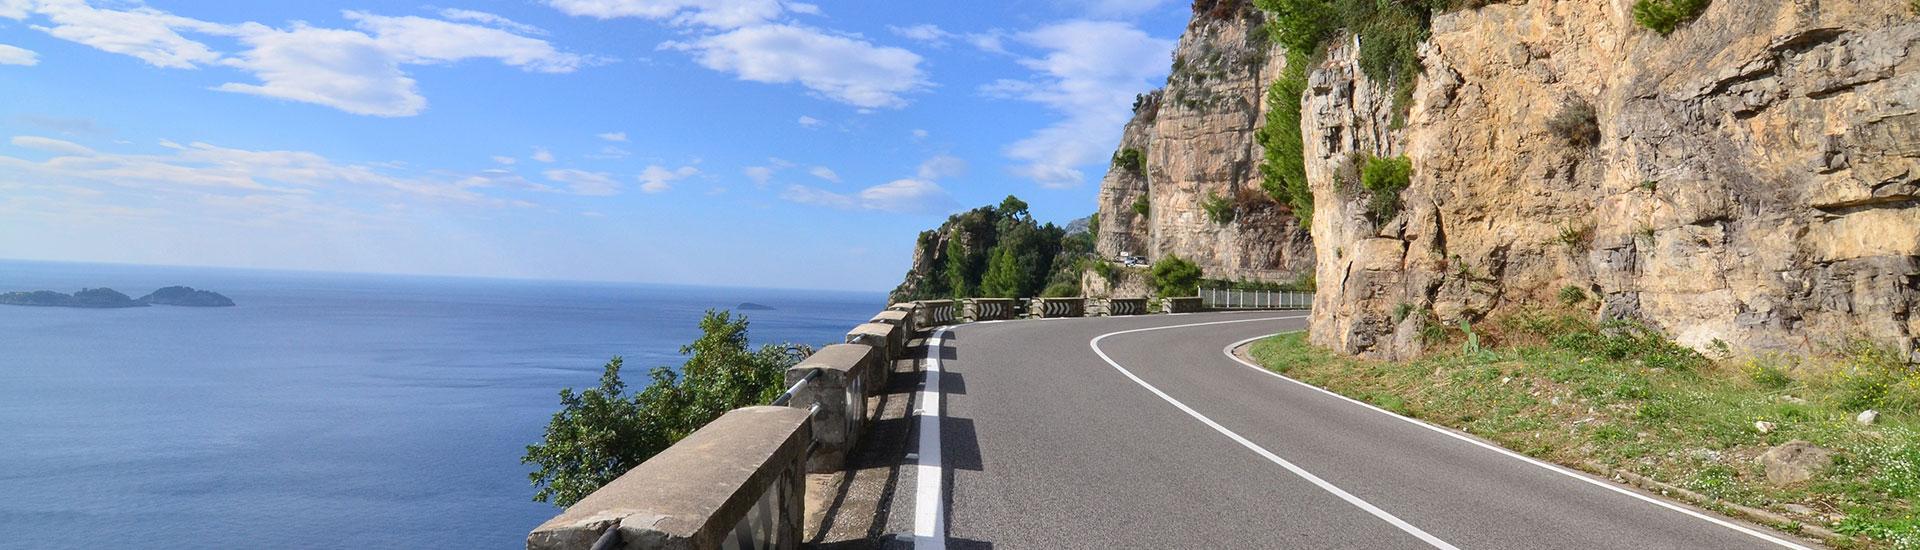 transfer hero amalfi coast